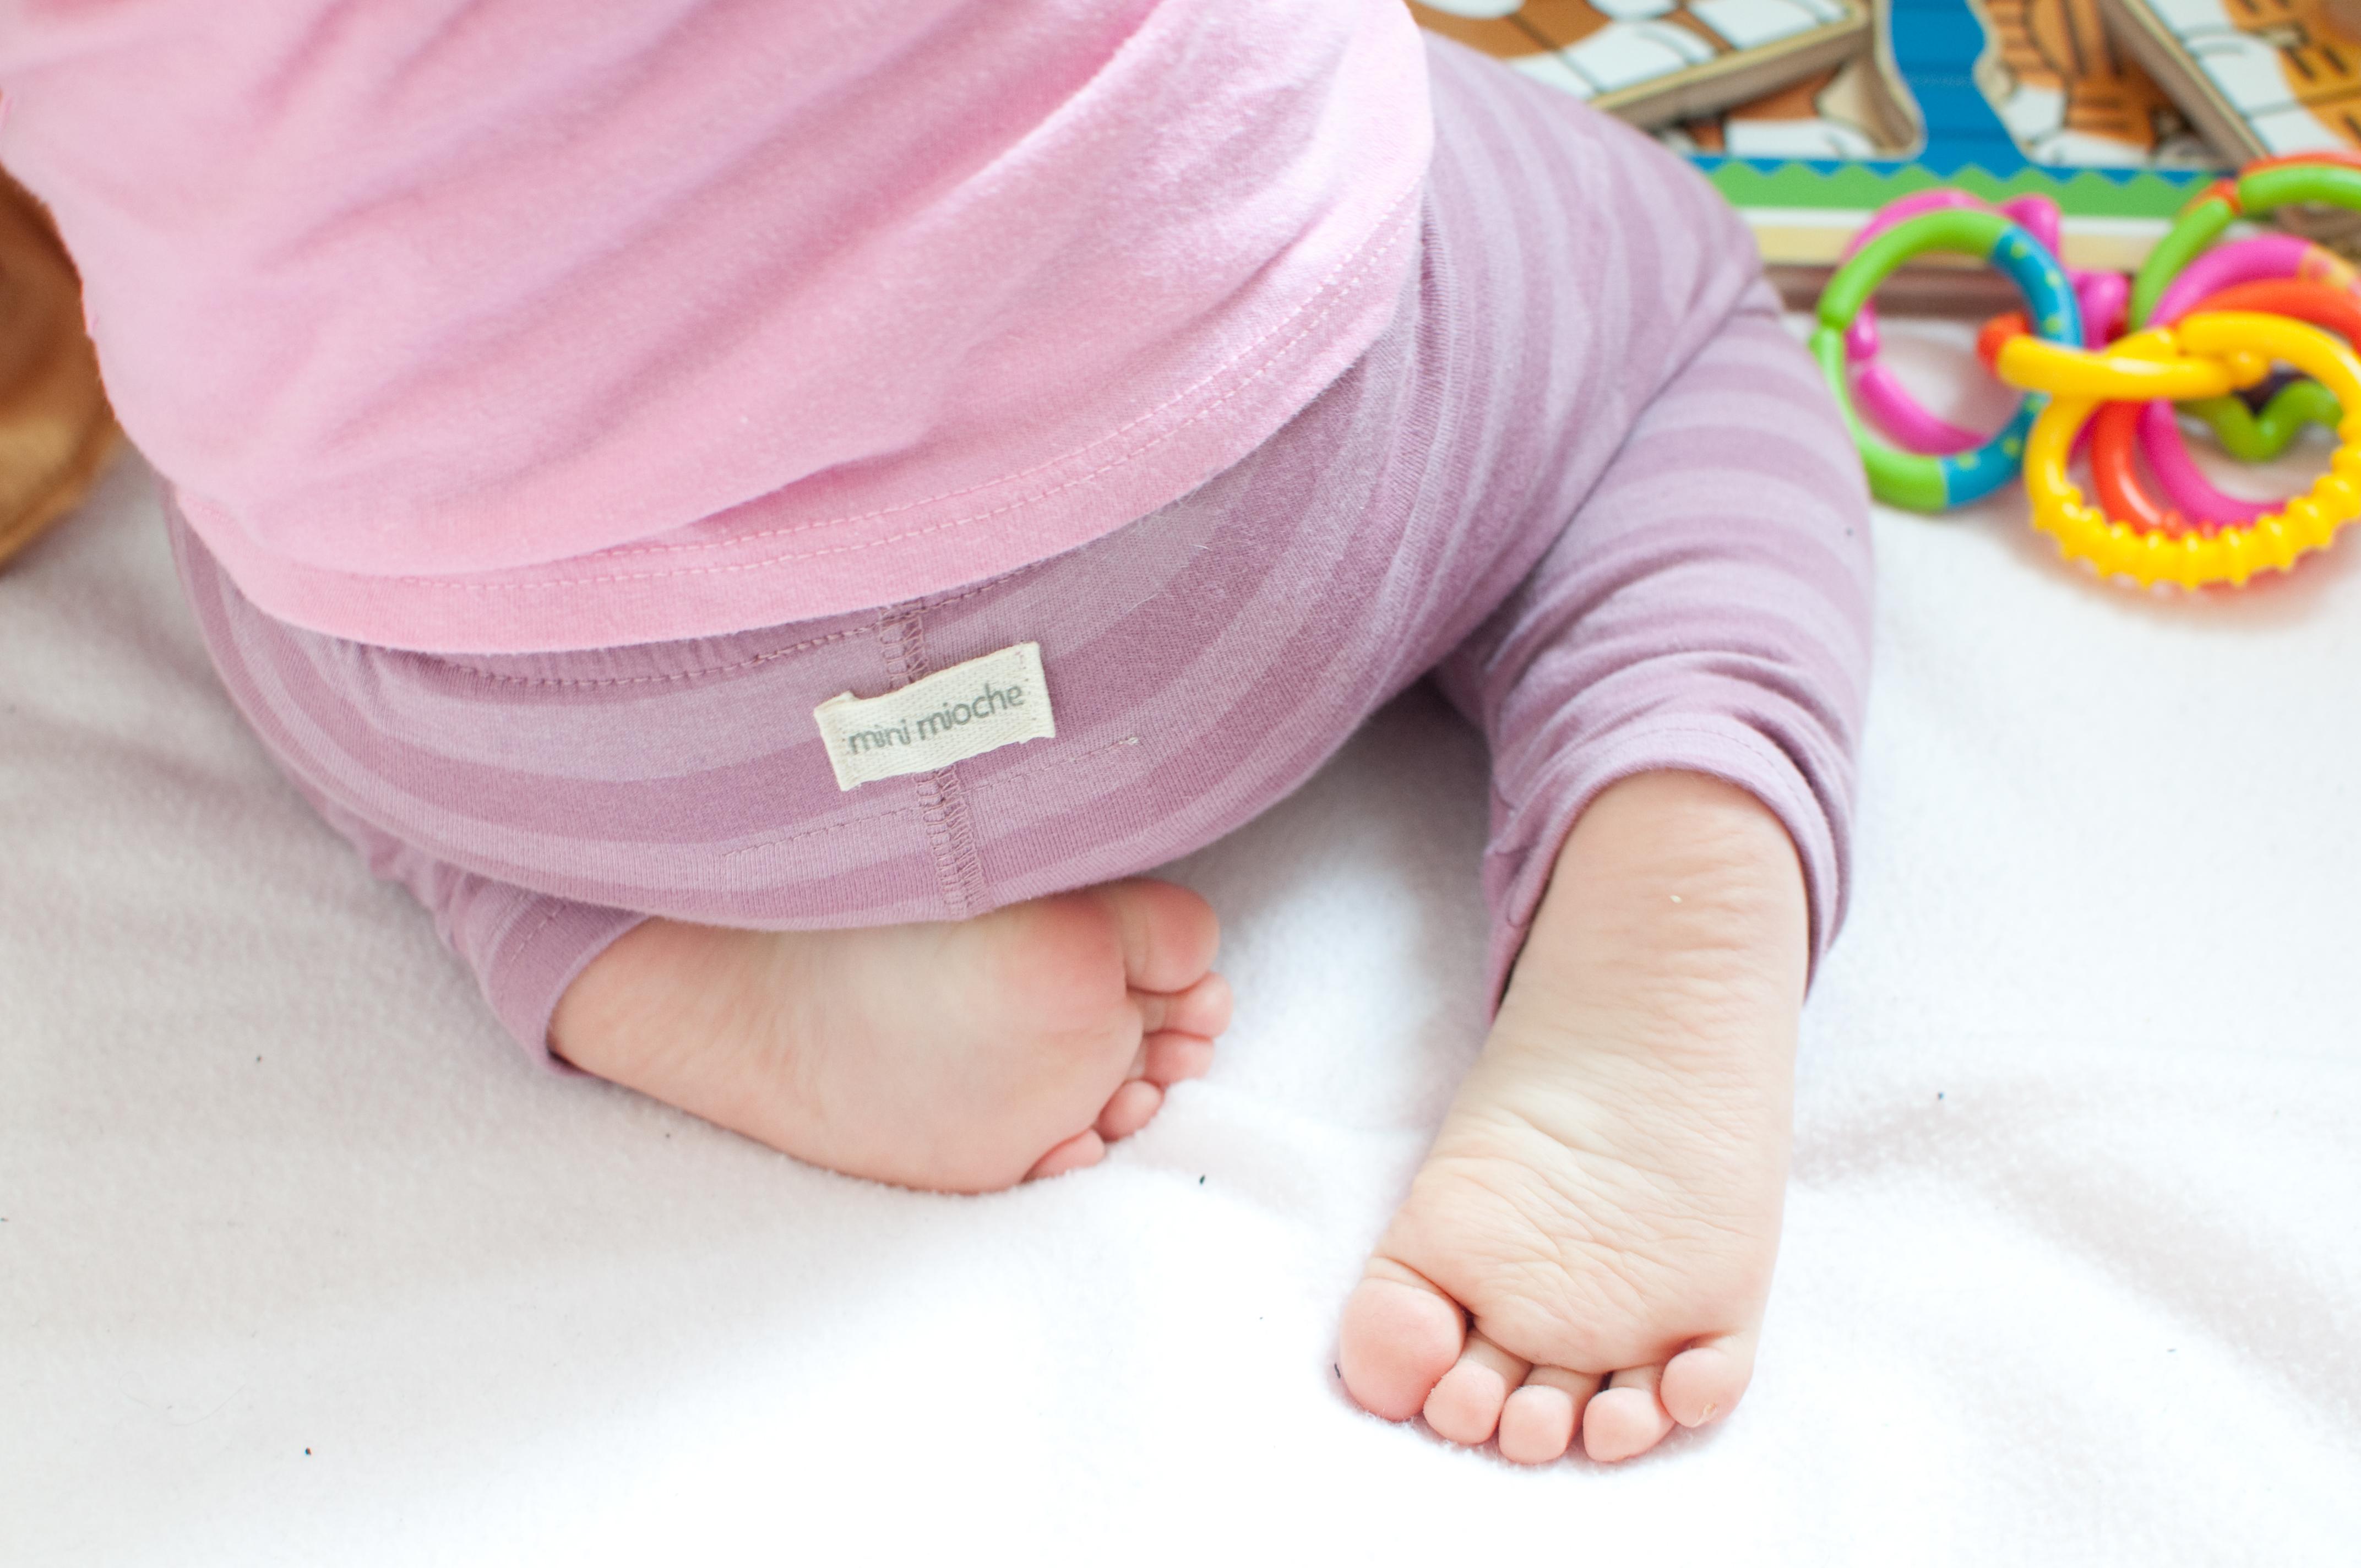 Fashion Mini Mioche Clothing For Babies Kids Sugar Muse